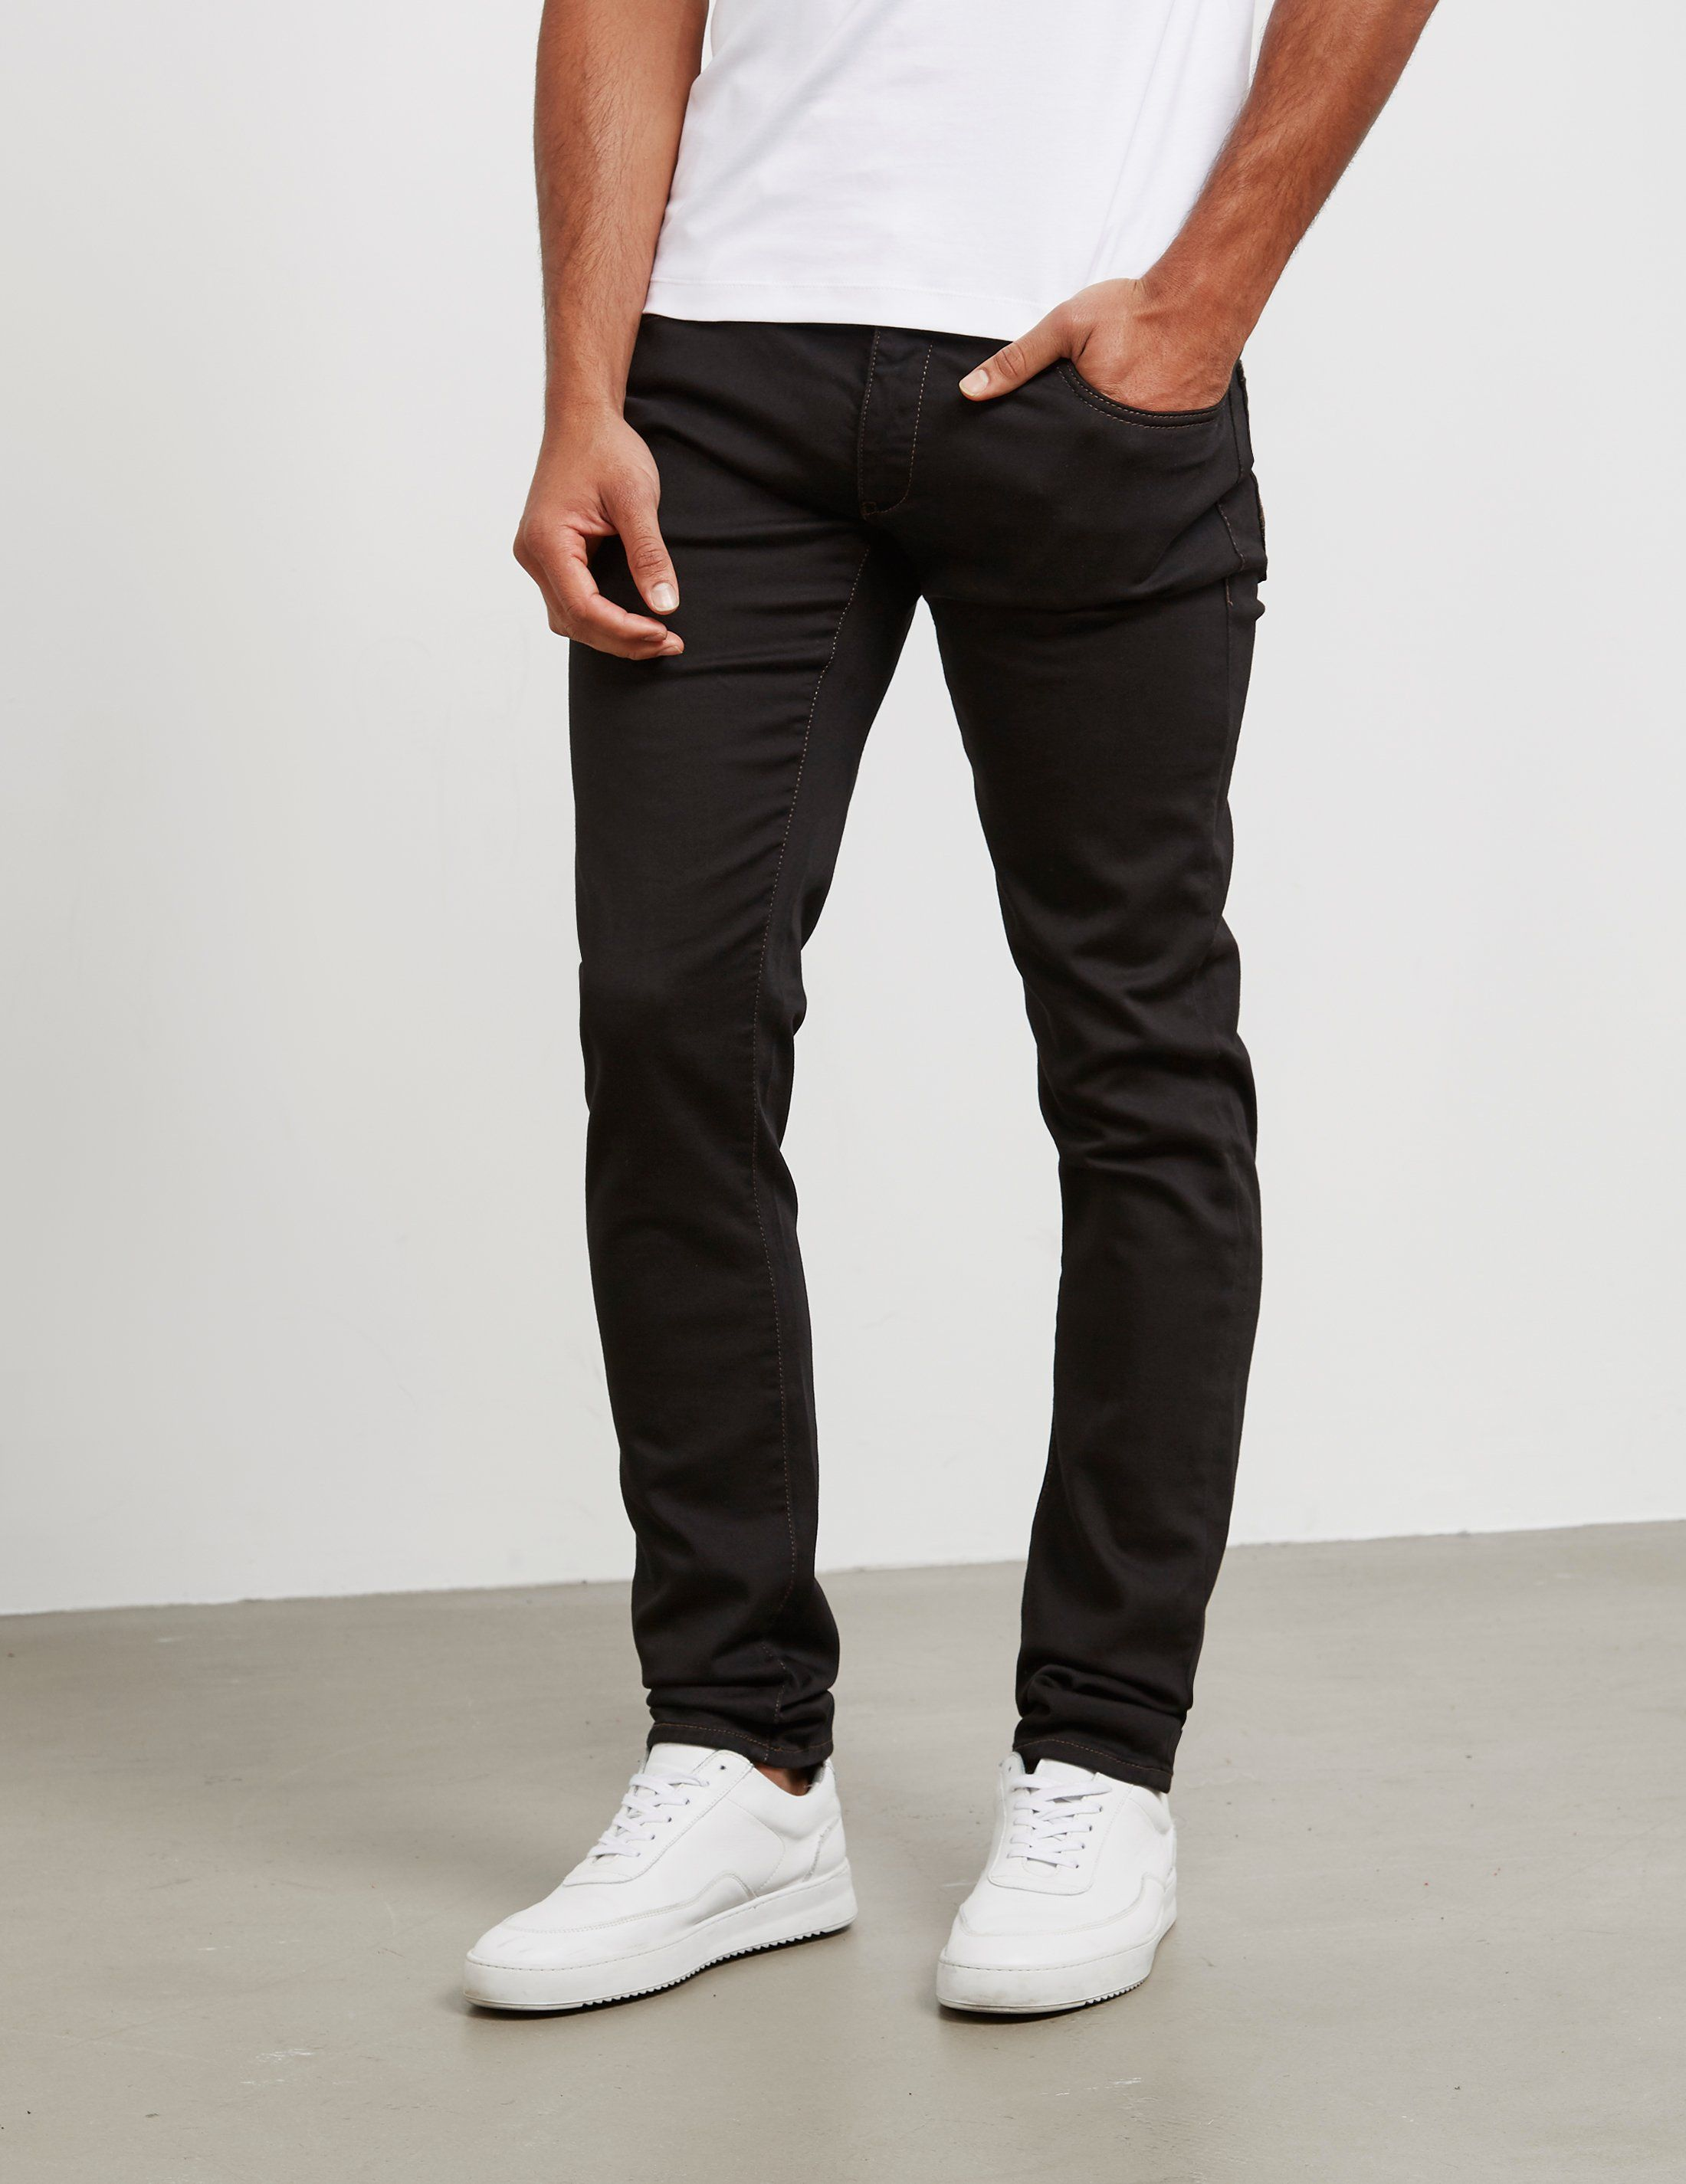 Emporio Armani J10 Stretch Slim Jeans